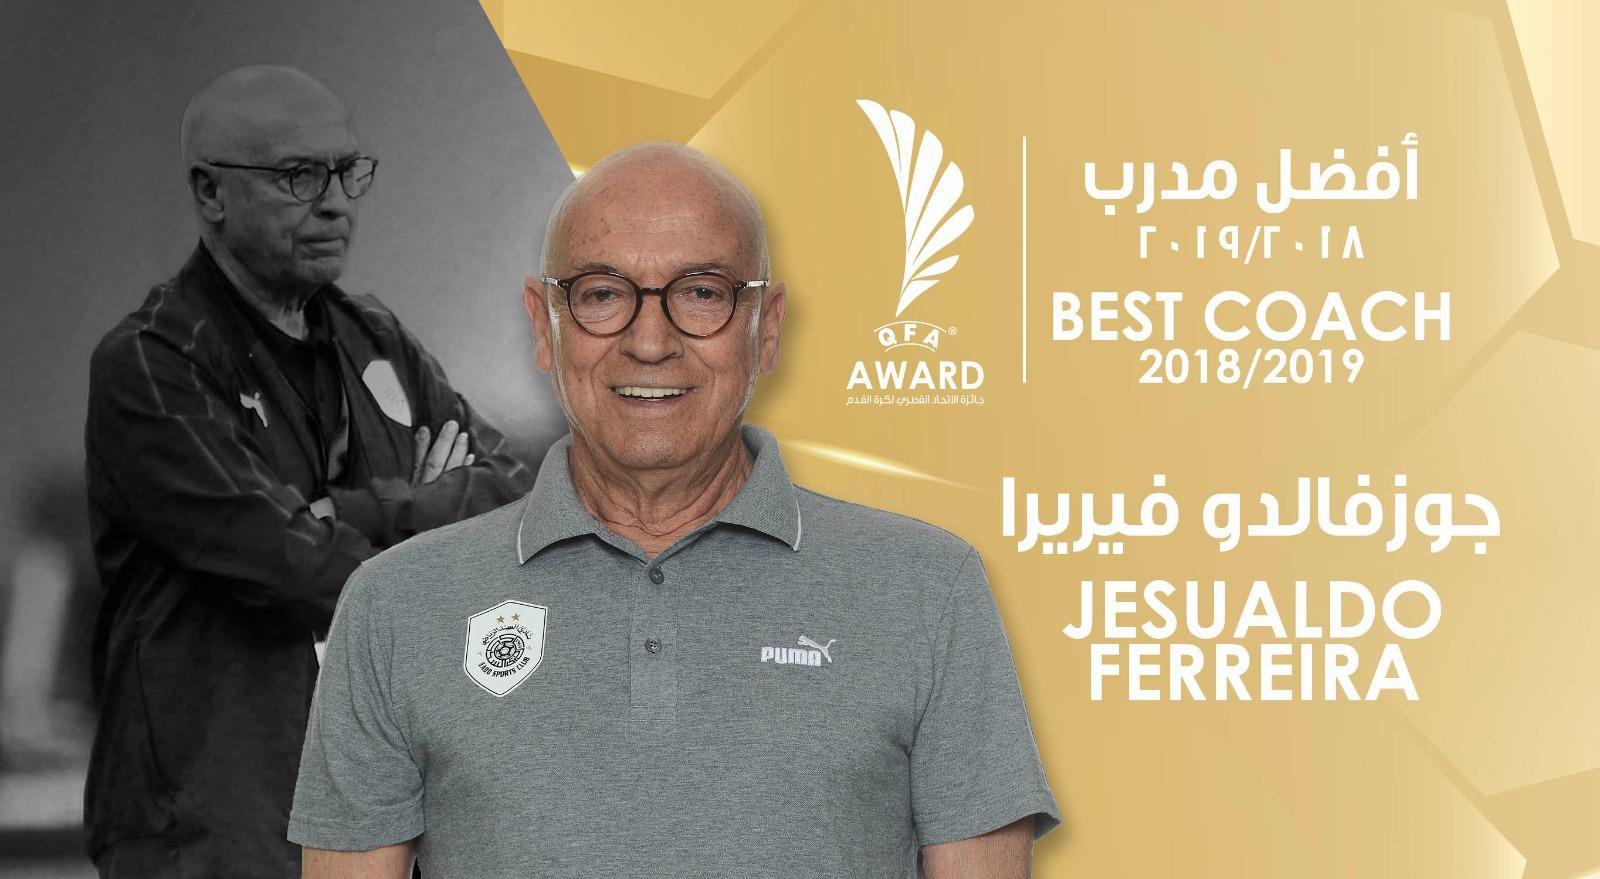 QFA Award: Jesualdo Ferreira is the best coach